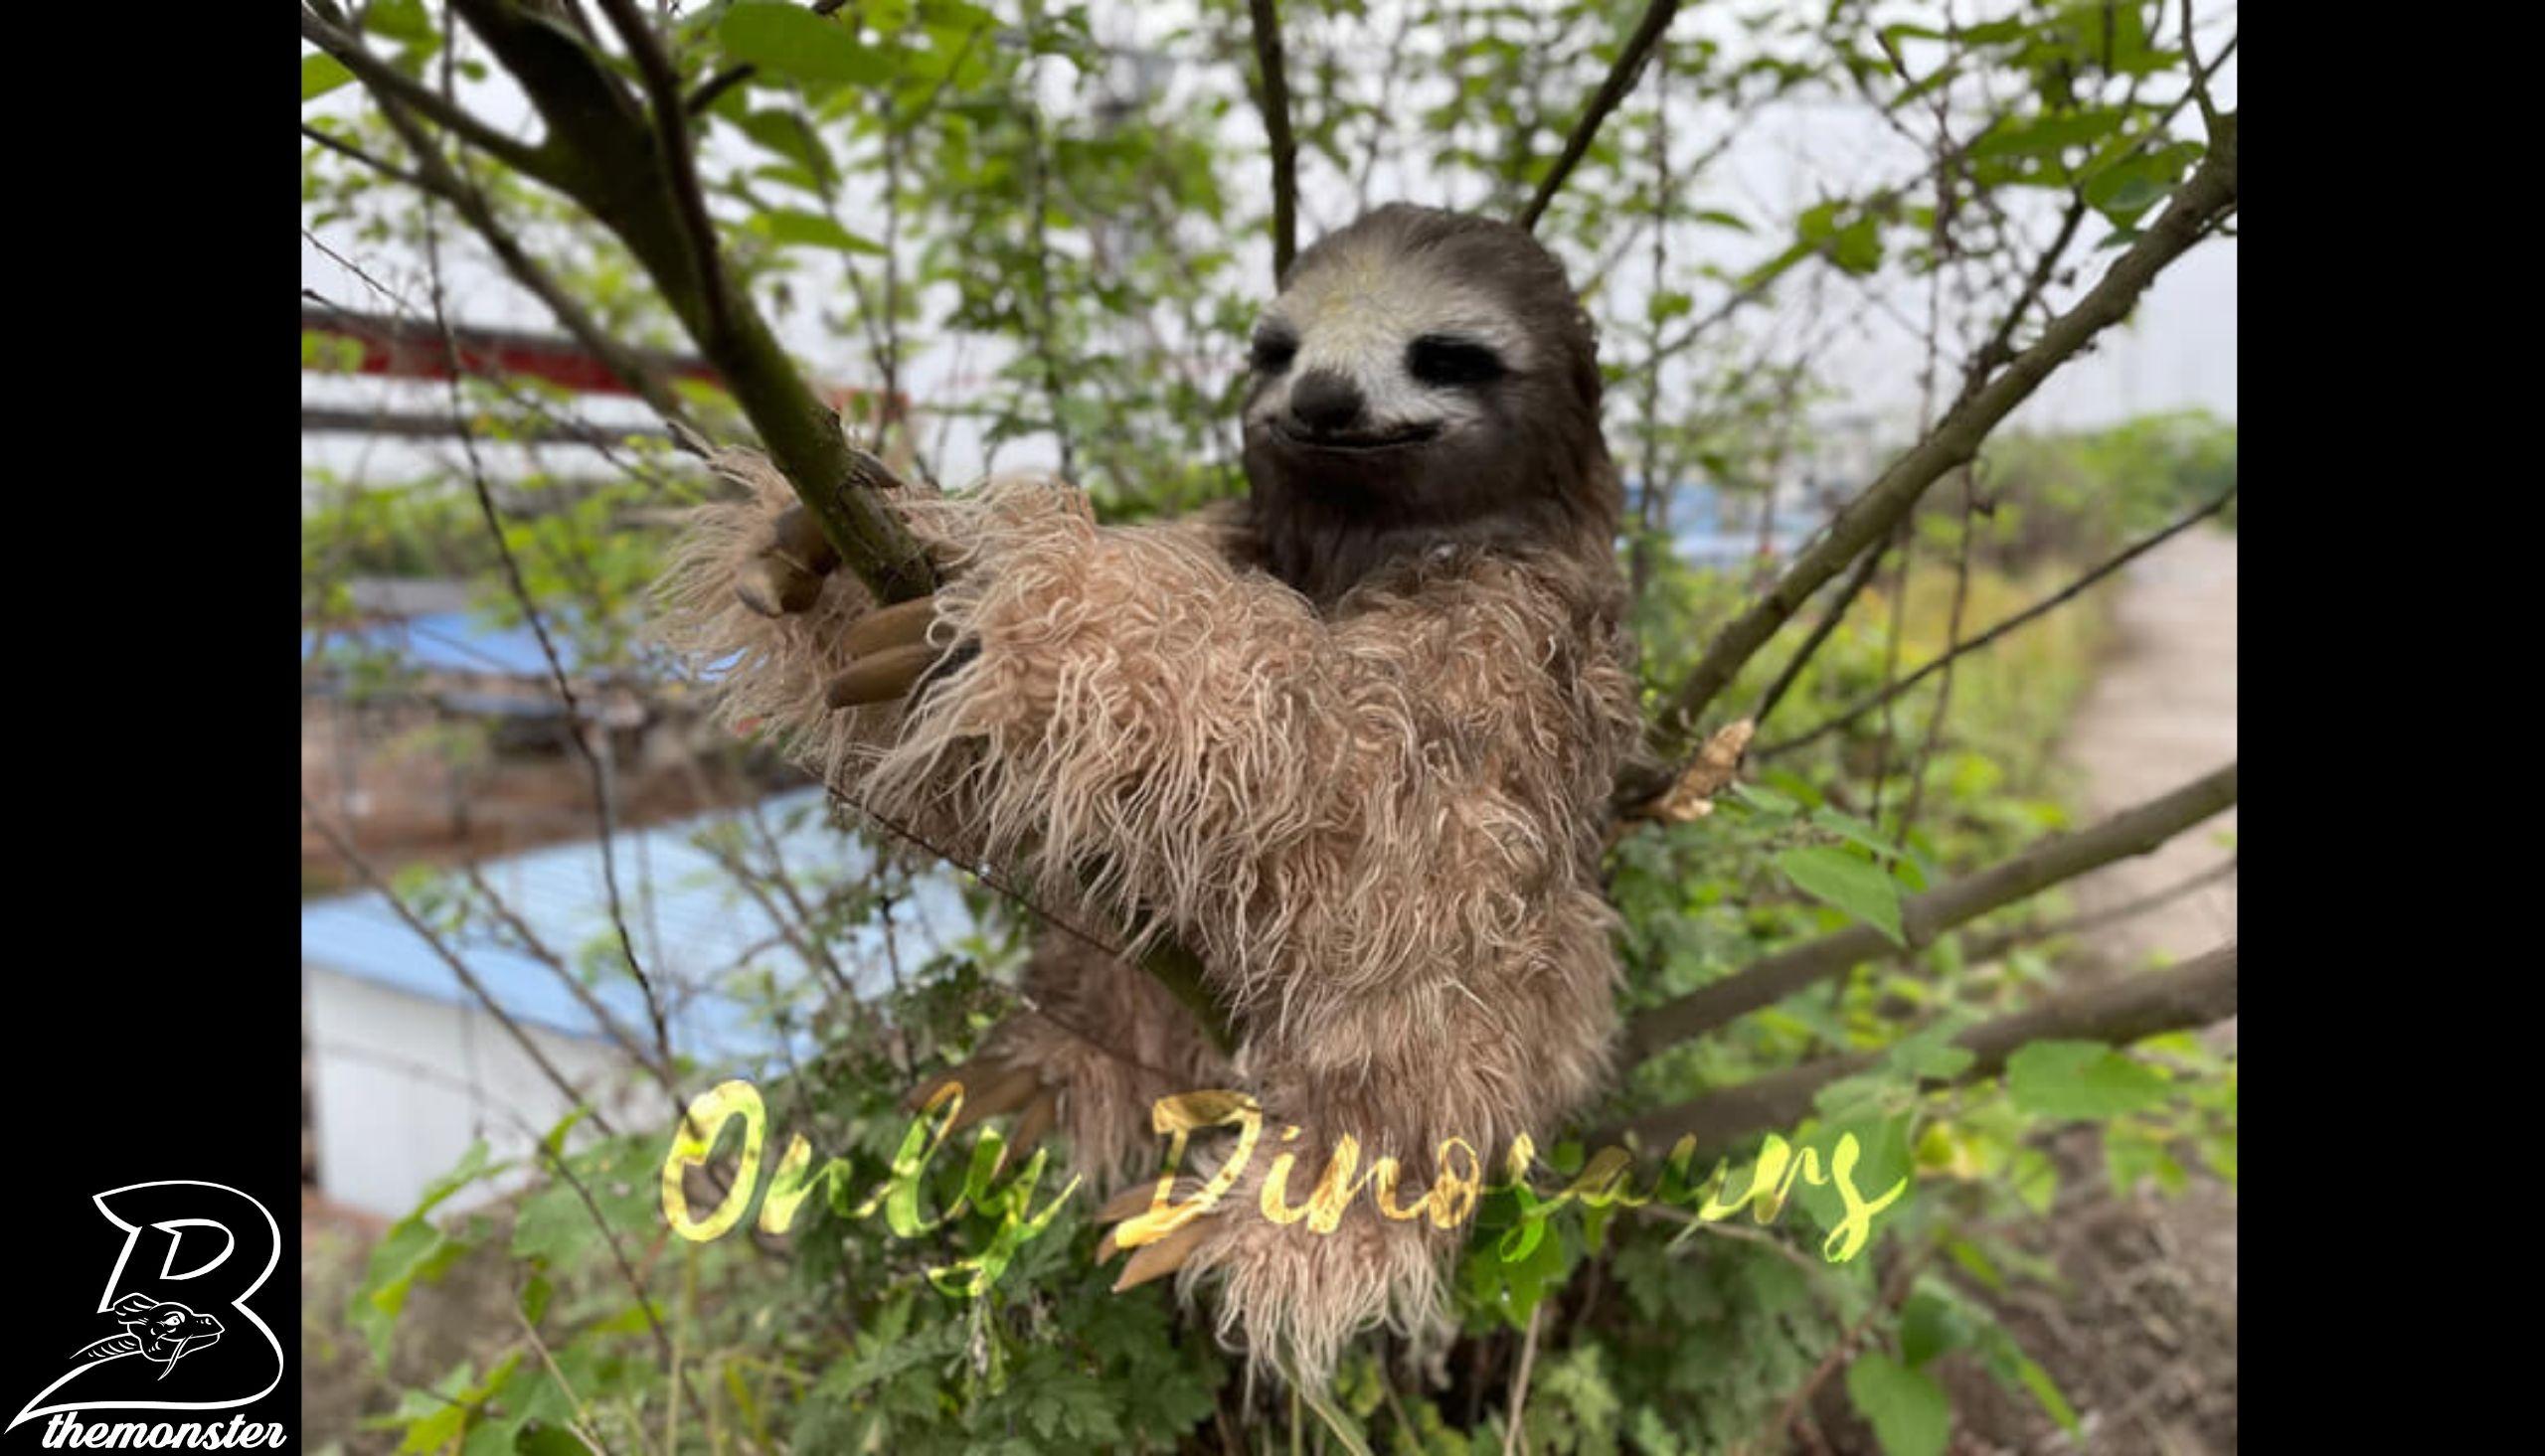 Realistic Sloth Animal Hand Puppet in vendita sul Bthemonster.com